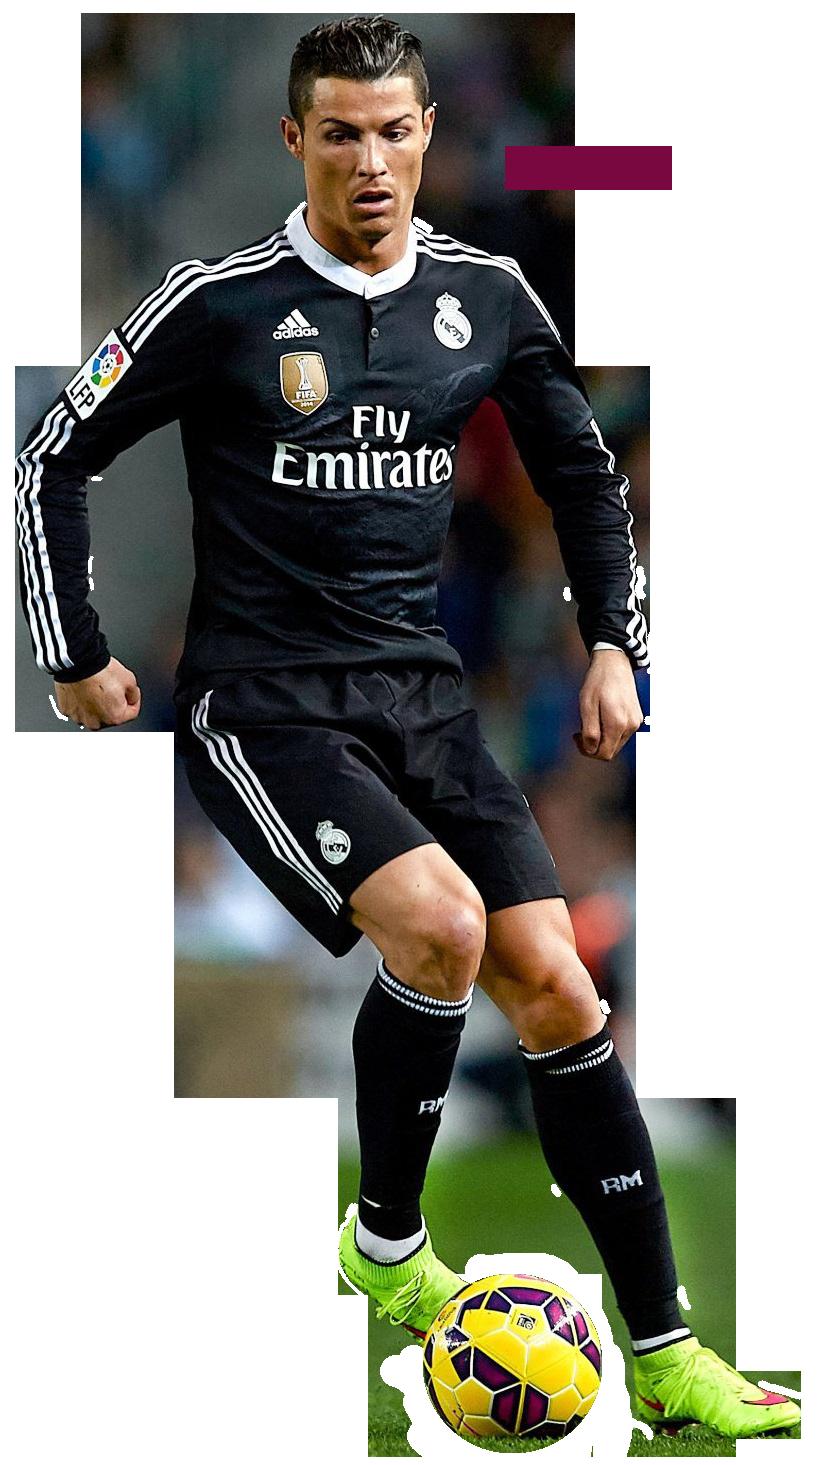 Soccer clipart ronaldo 1221 Ronaldo in Ronaldo Ronaldo